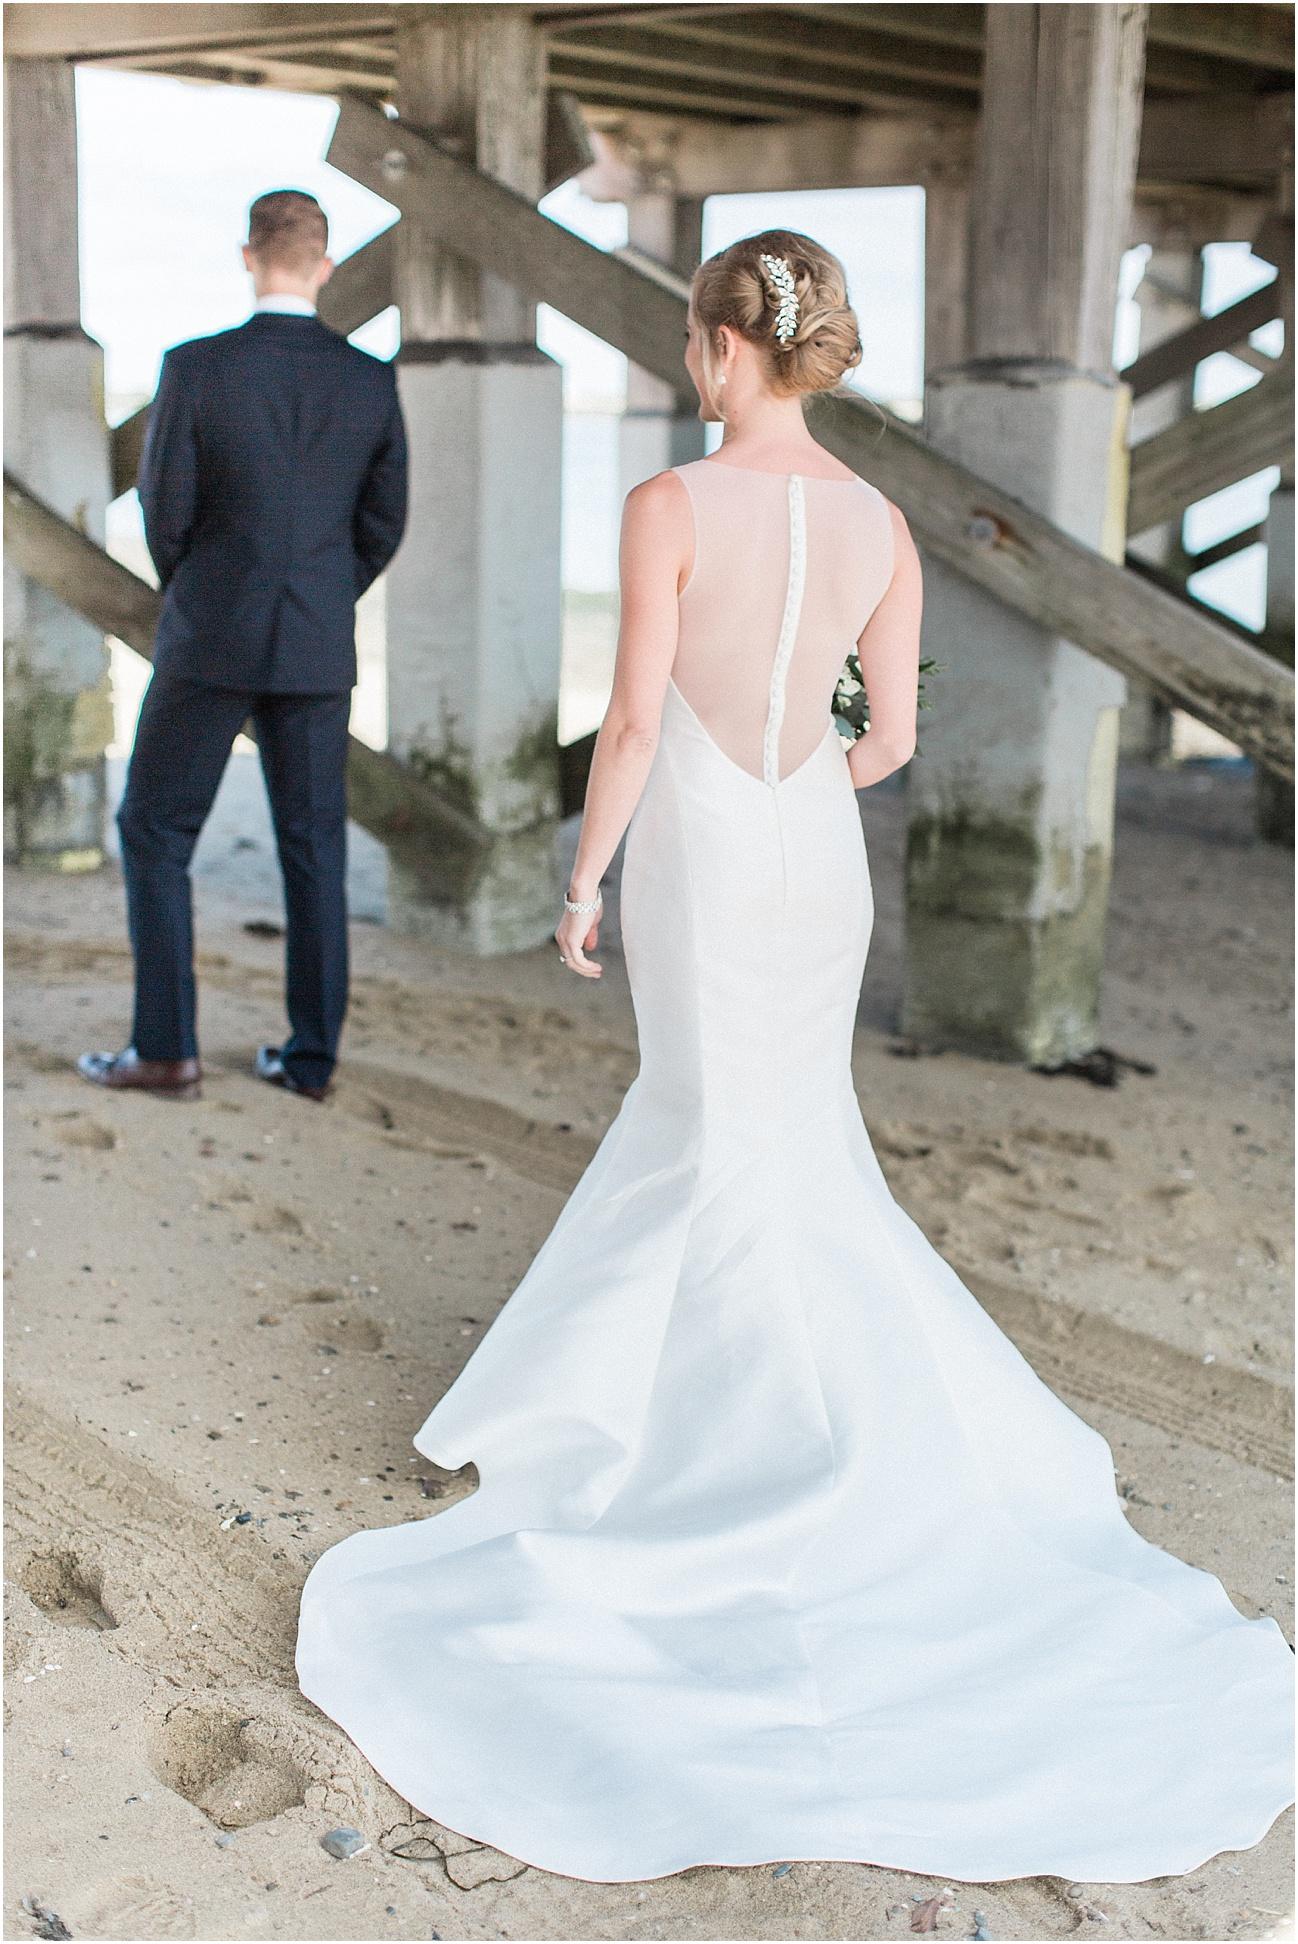 claire_gordon_duxbury_bay_maritime_school_beach_dock_powder_point_bridge_cape_cod_boston_wedding_photographer_meredith_jane_photography_photo_0579.jpg